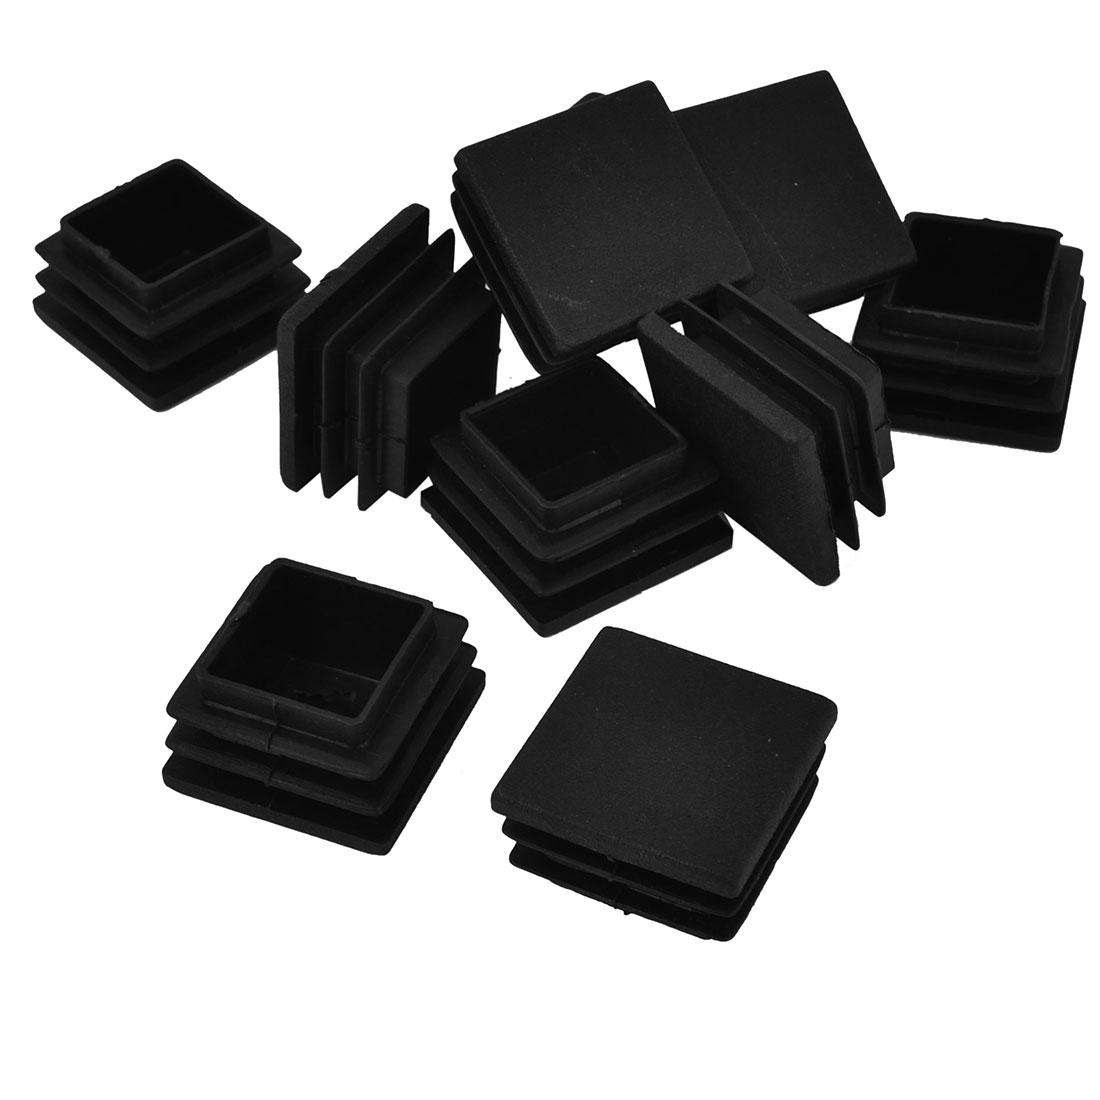 30mm x 30mm Black Hard Plastic Tubing Tube Insert Blanking End Caps 10Pcs